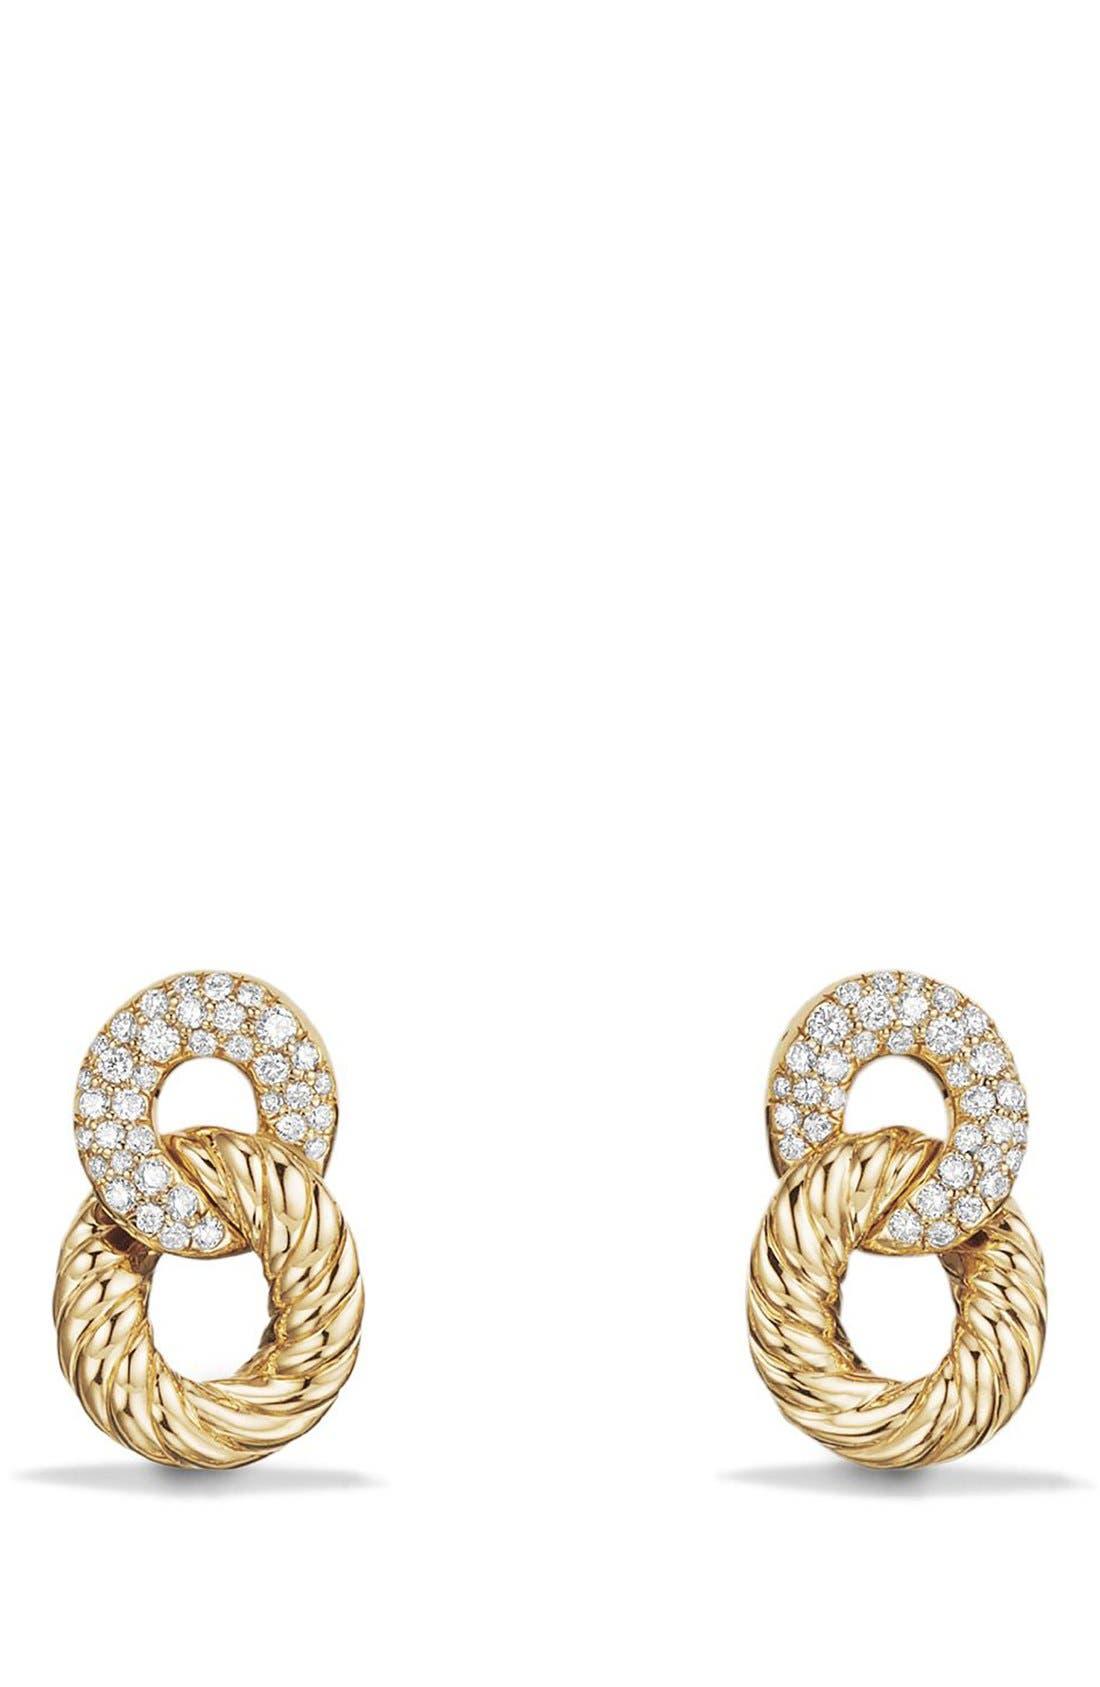 Main Image - David Yurman Extra-Small Curb Link Drop Earrings with Diamond in 18K Gold